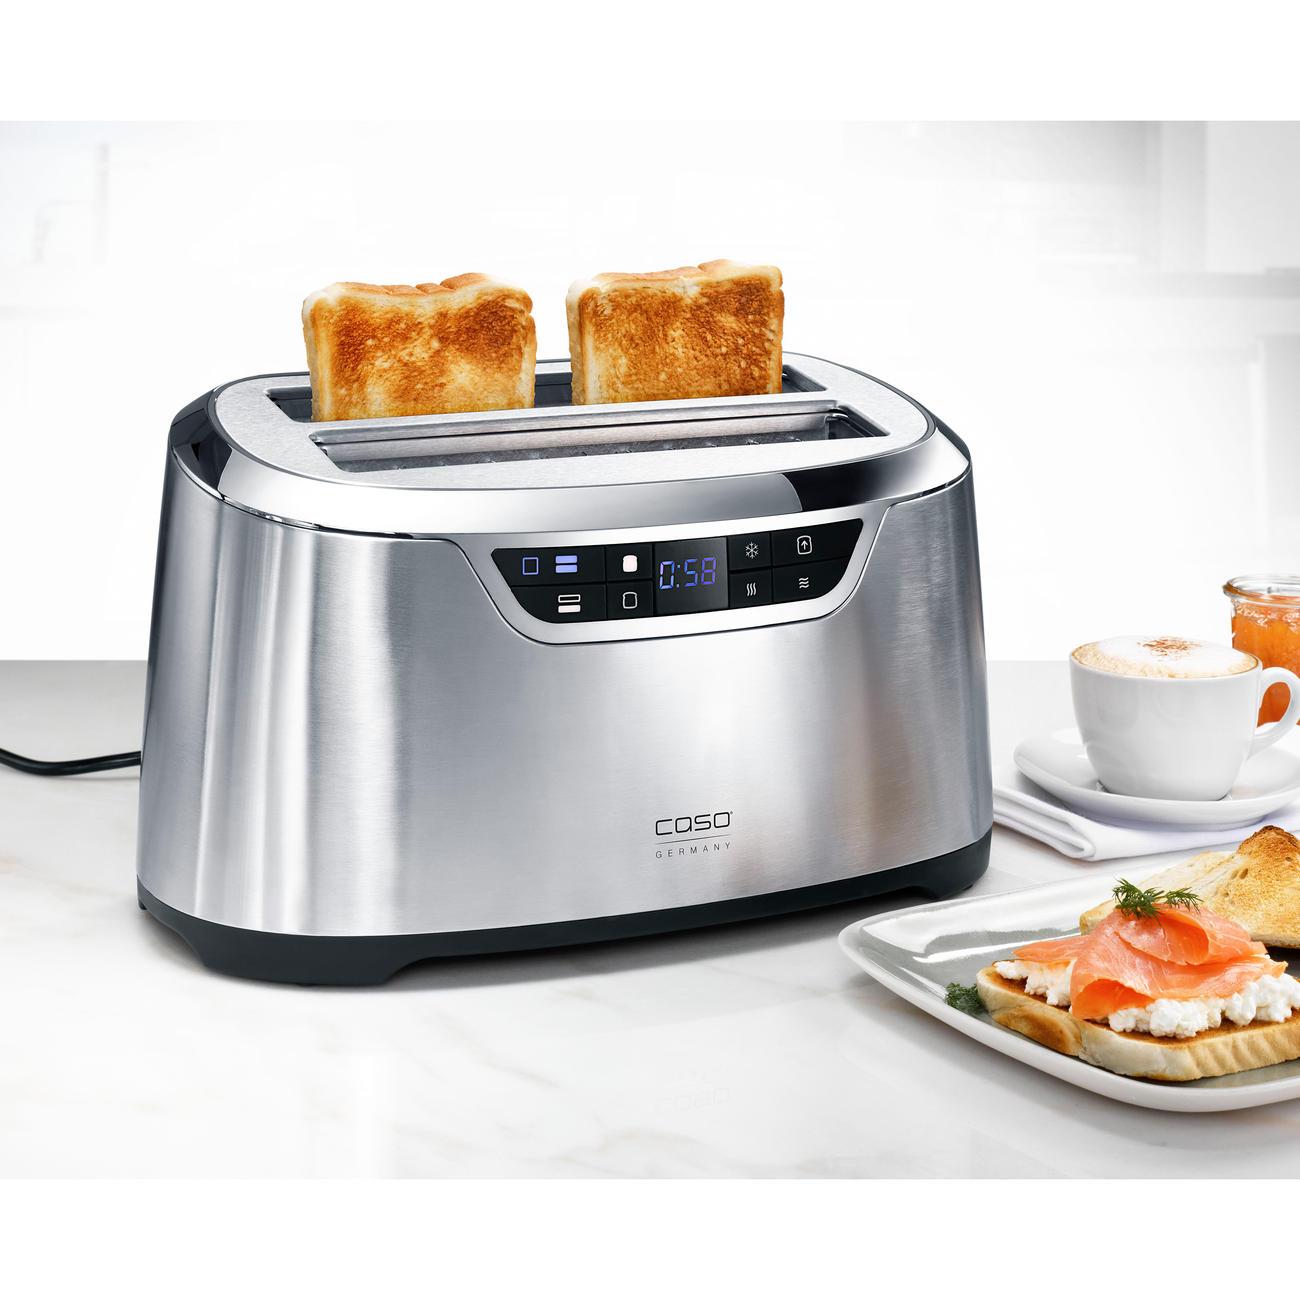 caso toaster novea t4 2777 1600 w edelstahl kaufen. Black Bedroom Furniture Sets. Home Design Ideas